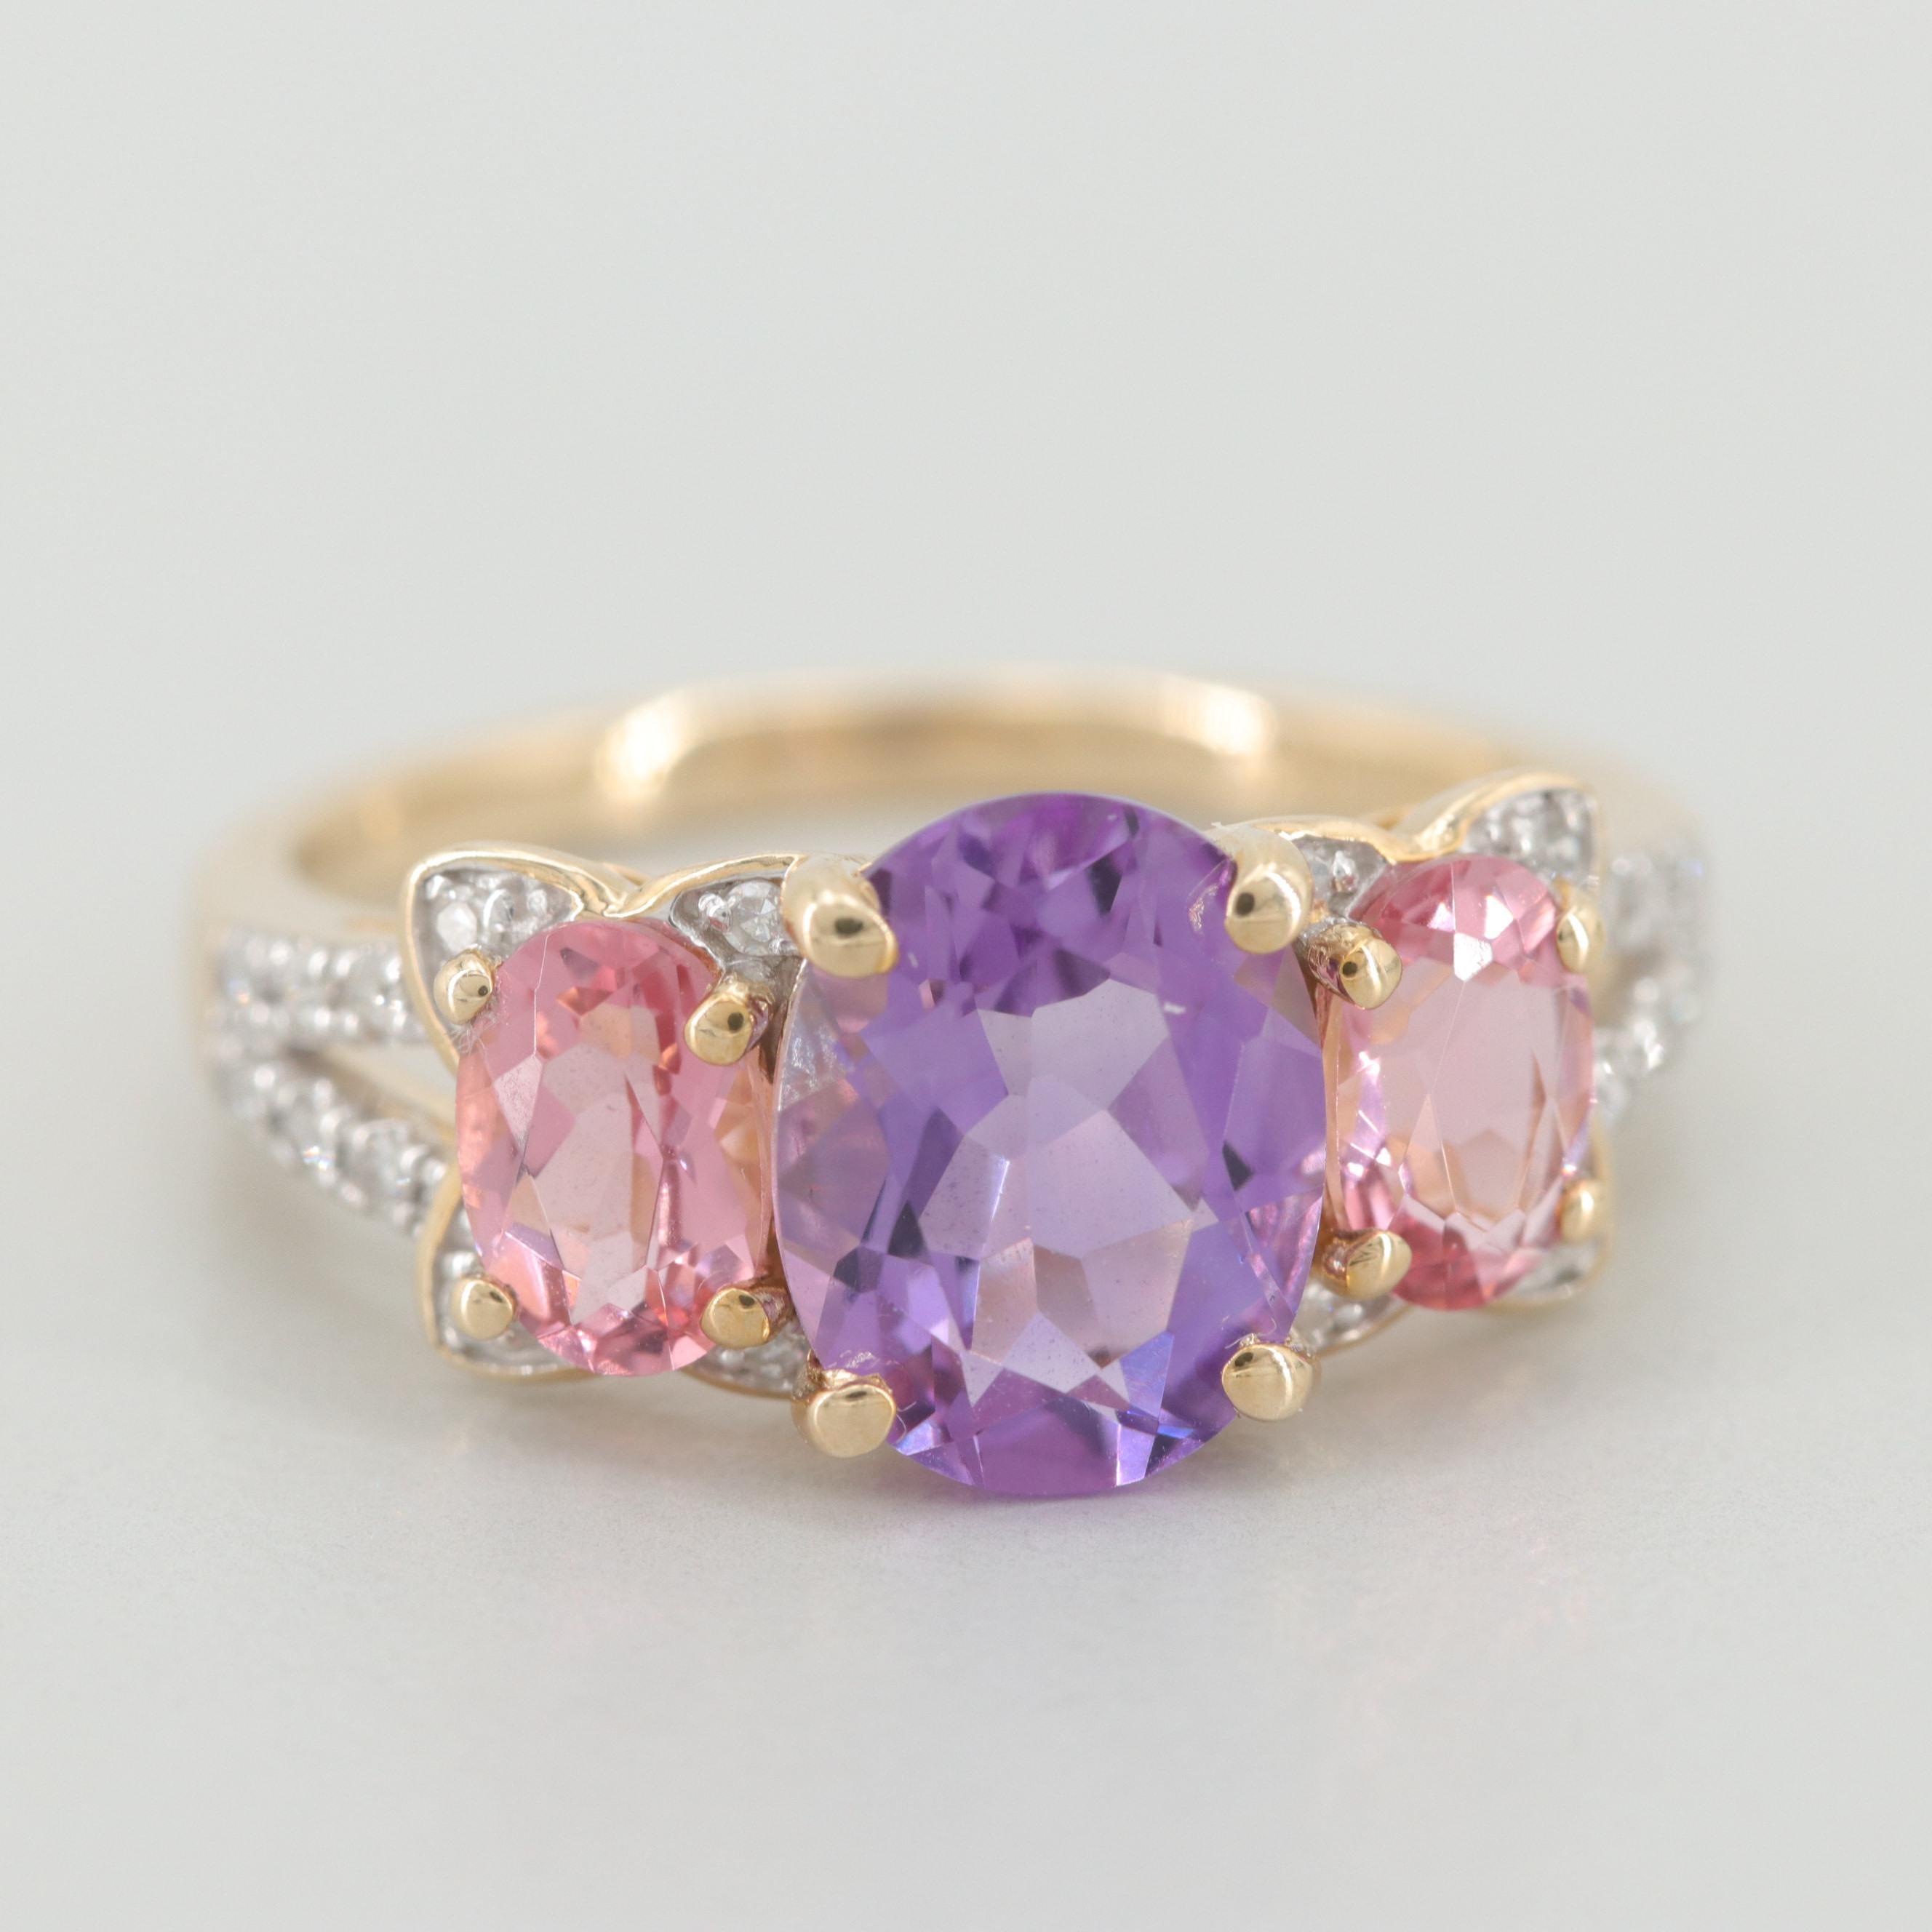 10K Yellow Gold Amethyst, Pink Tourmaline and Diamond Ring